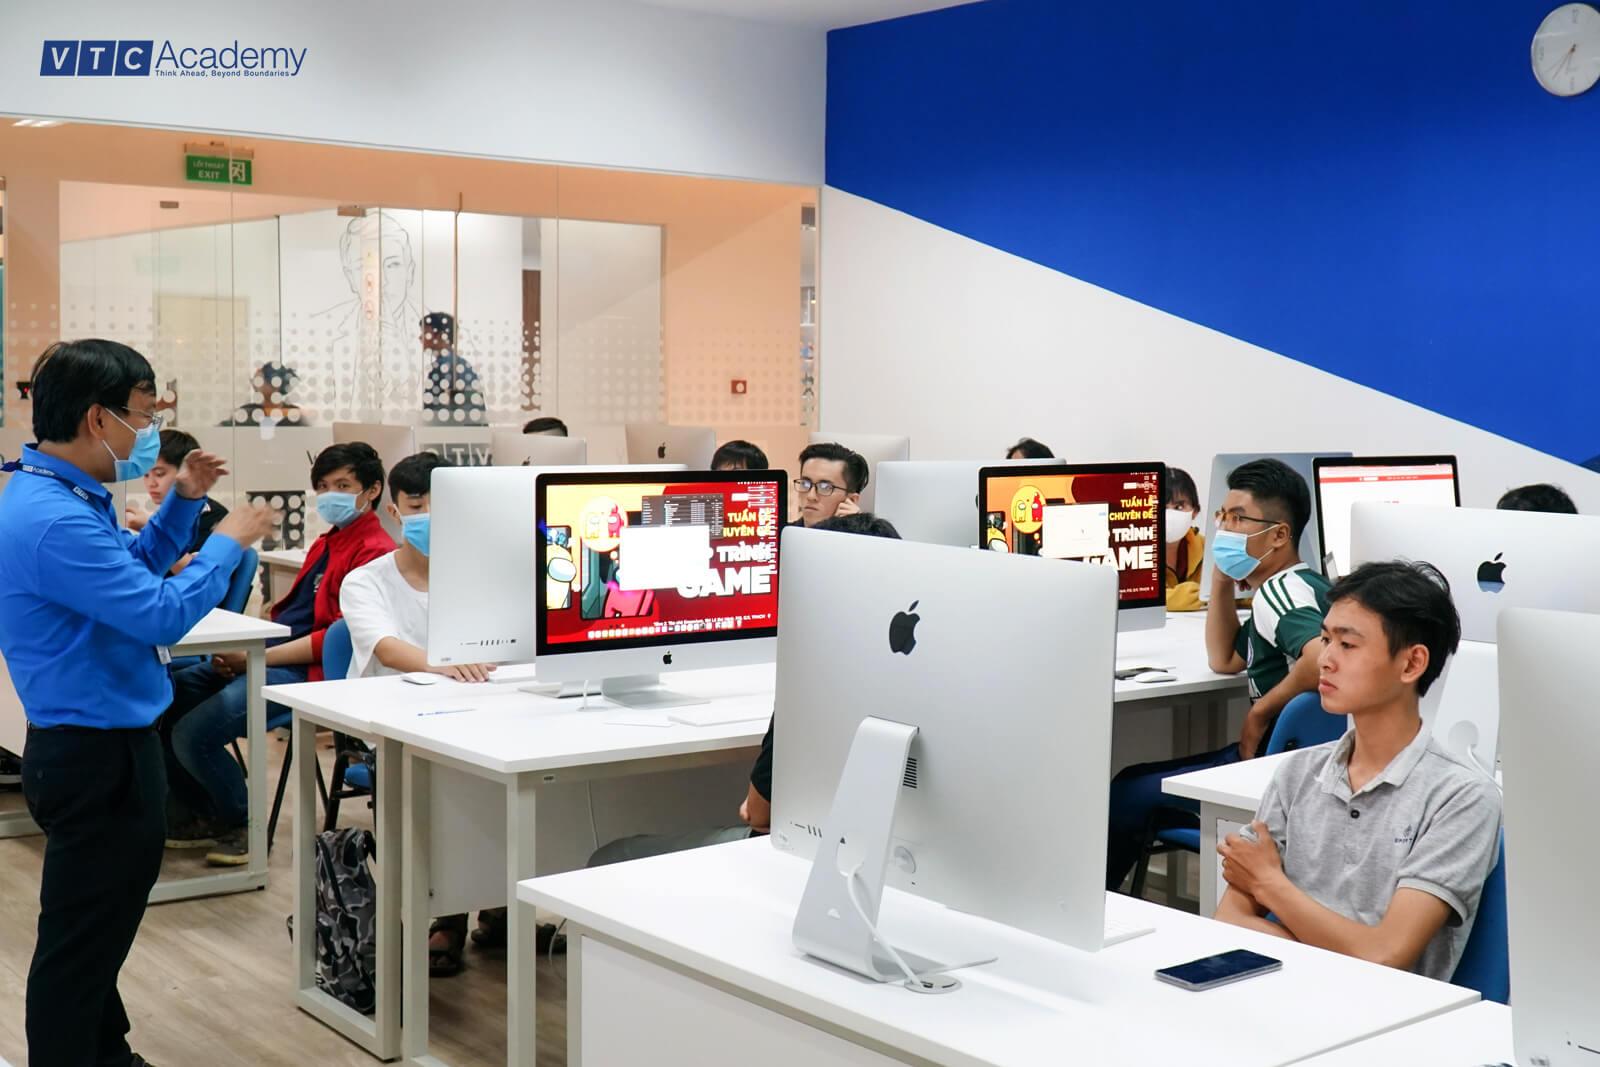 vtc-academy-hoc-thu-lap-trinh-game-6